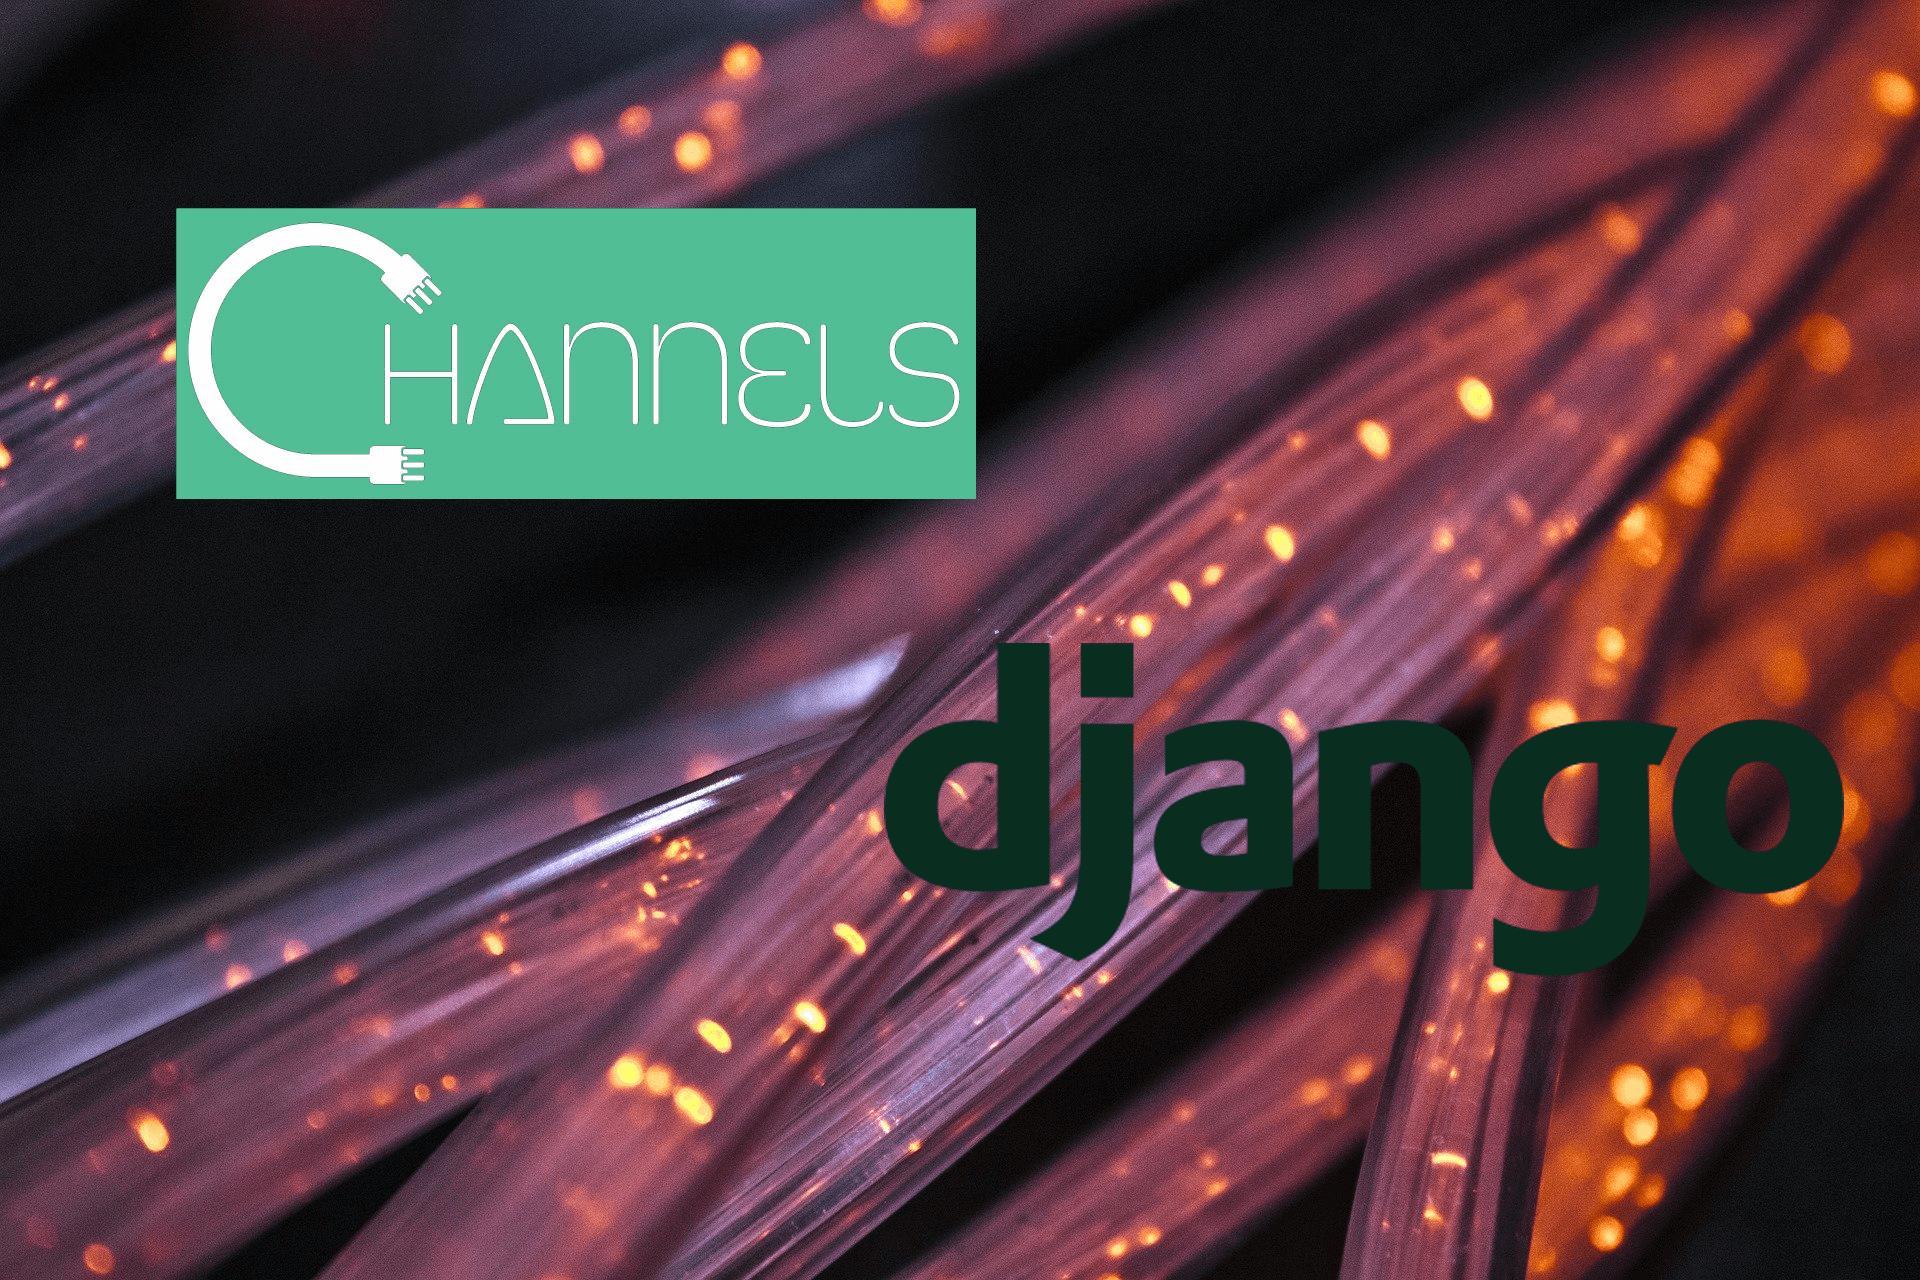 django channels примеры